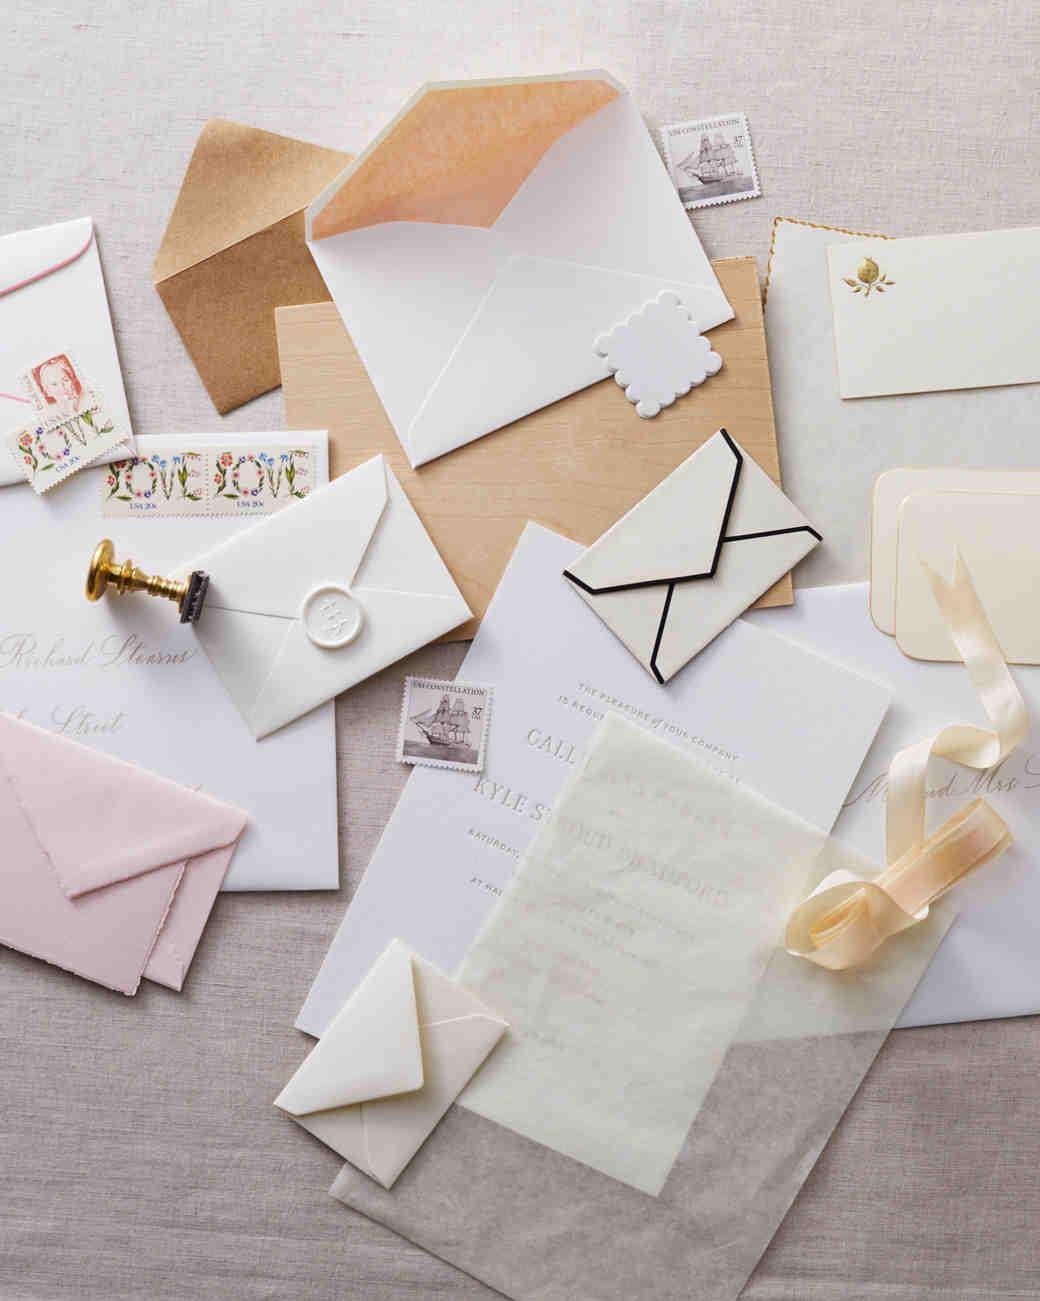 how to address wedding invitation envelopes wedding invitation envelopes Wedding Invitation Envelopes 1 of 7